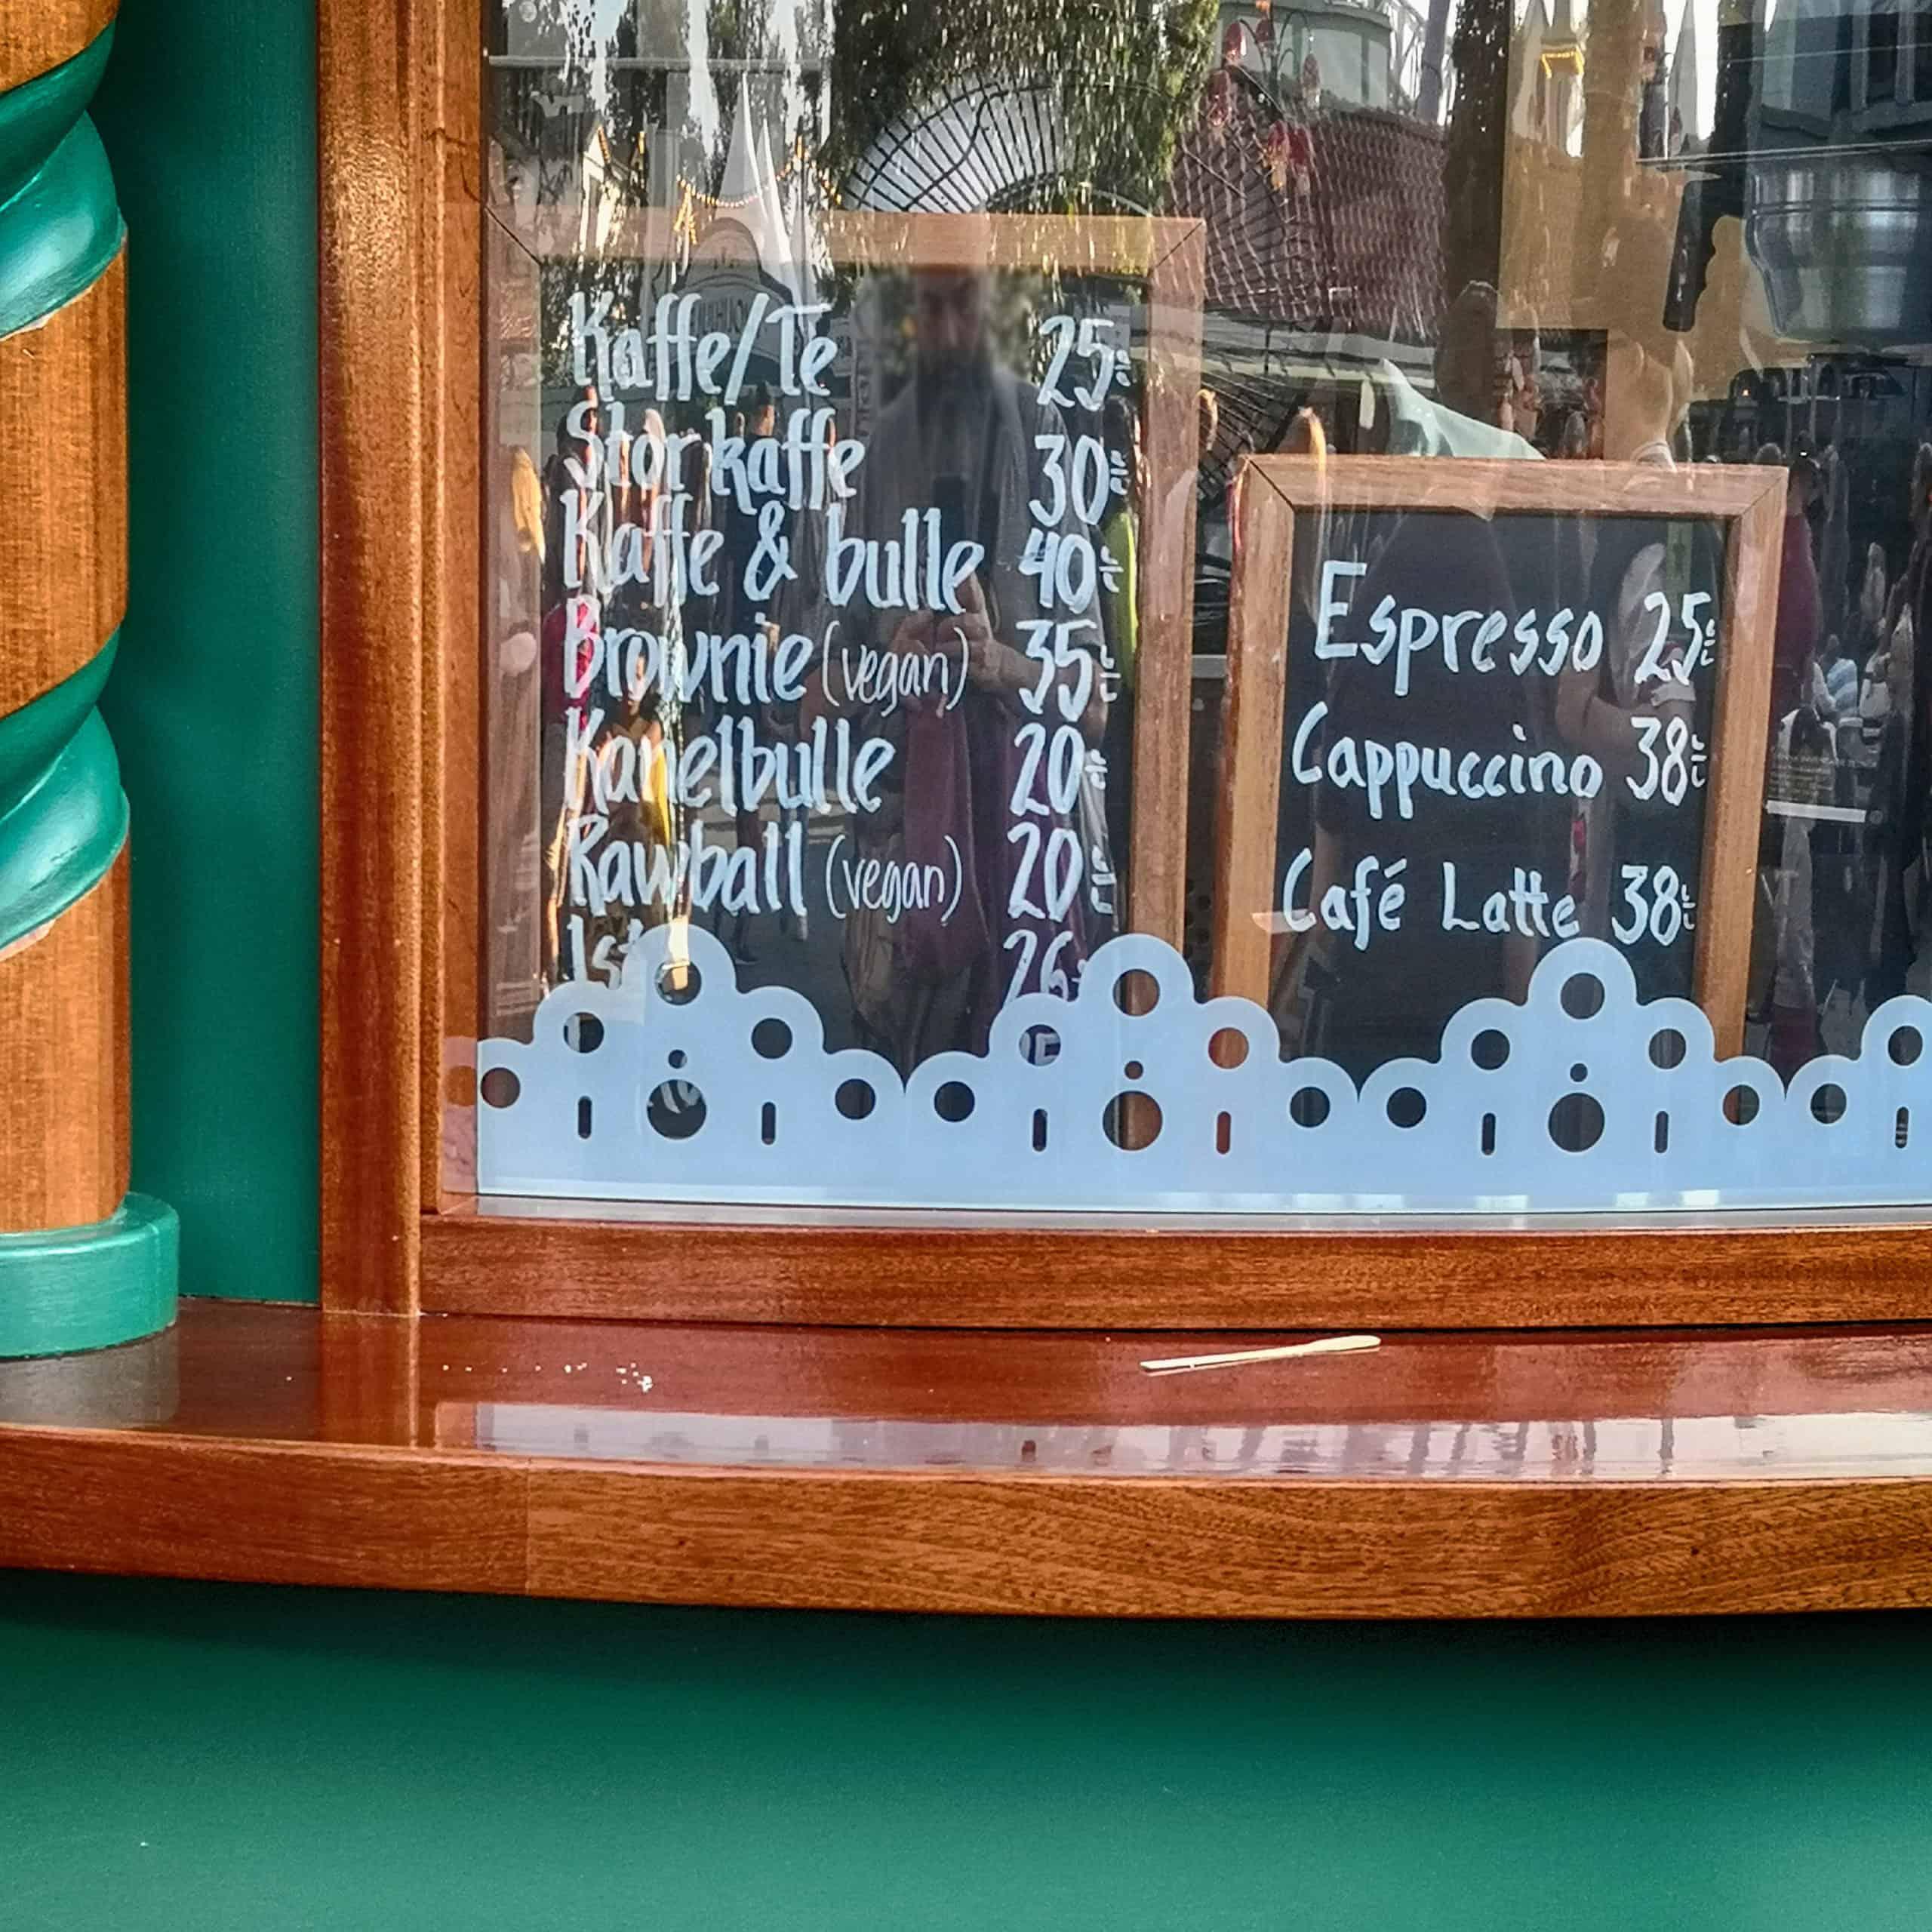 Espresso καφέ και είδη